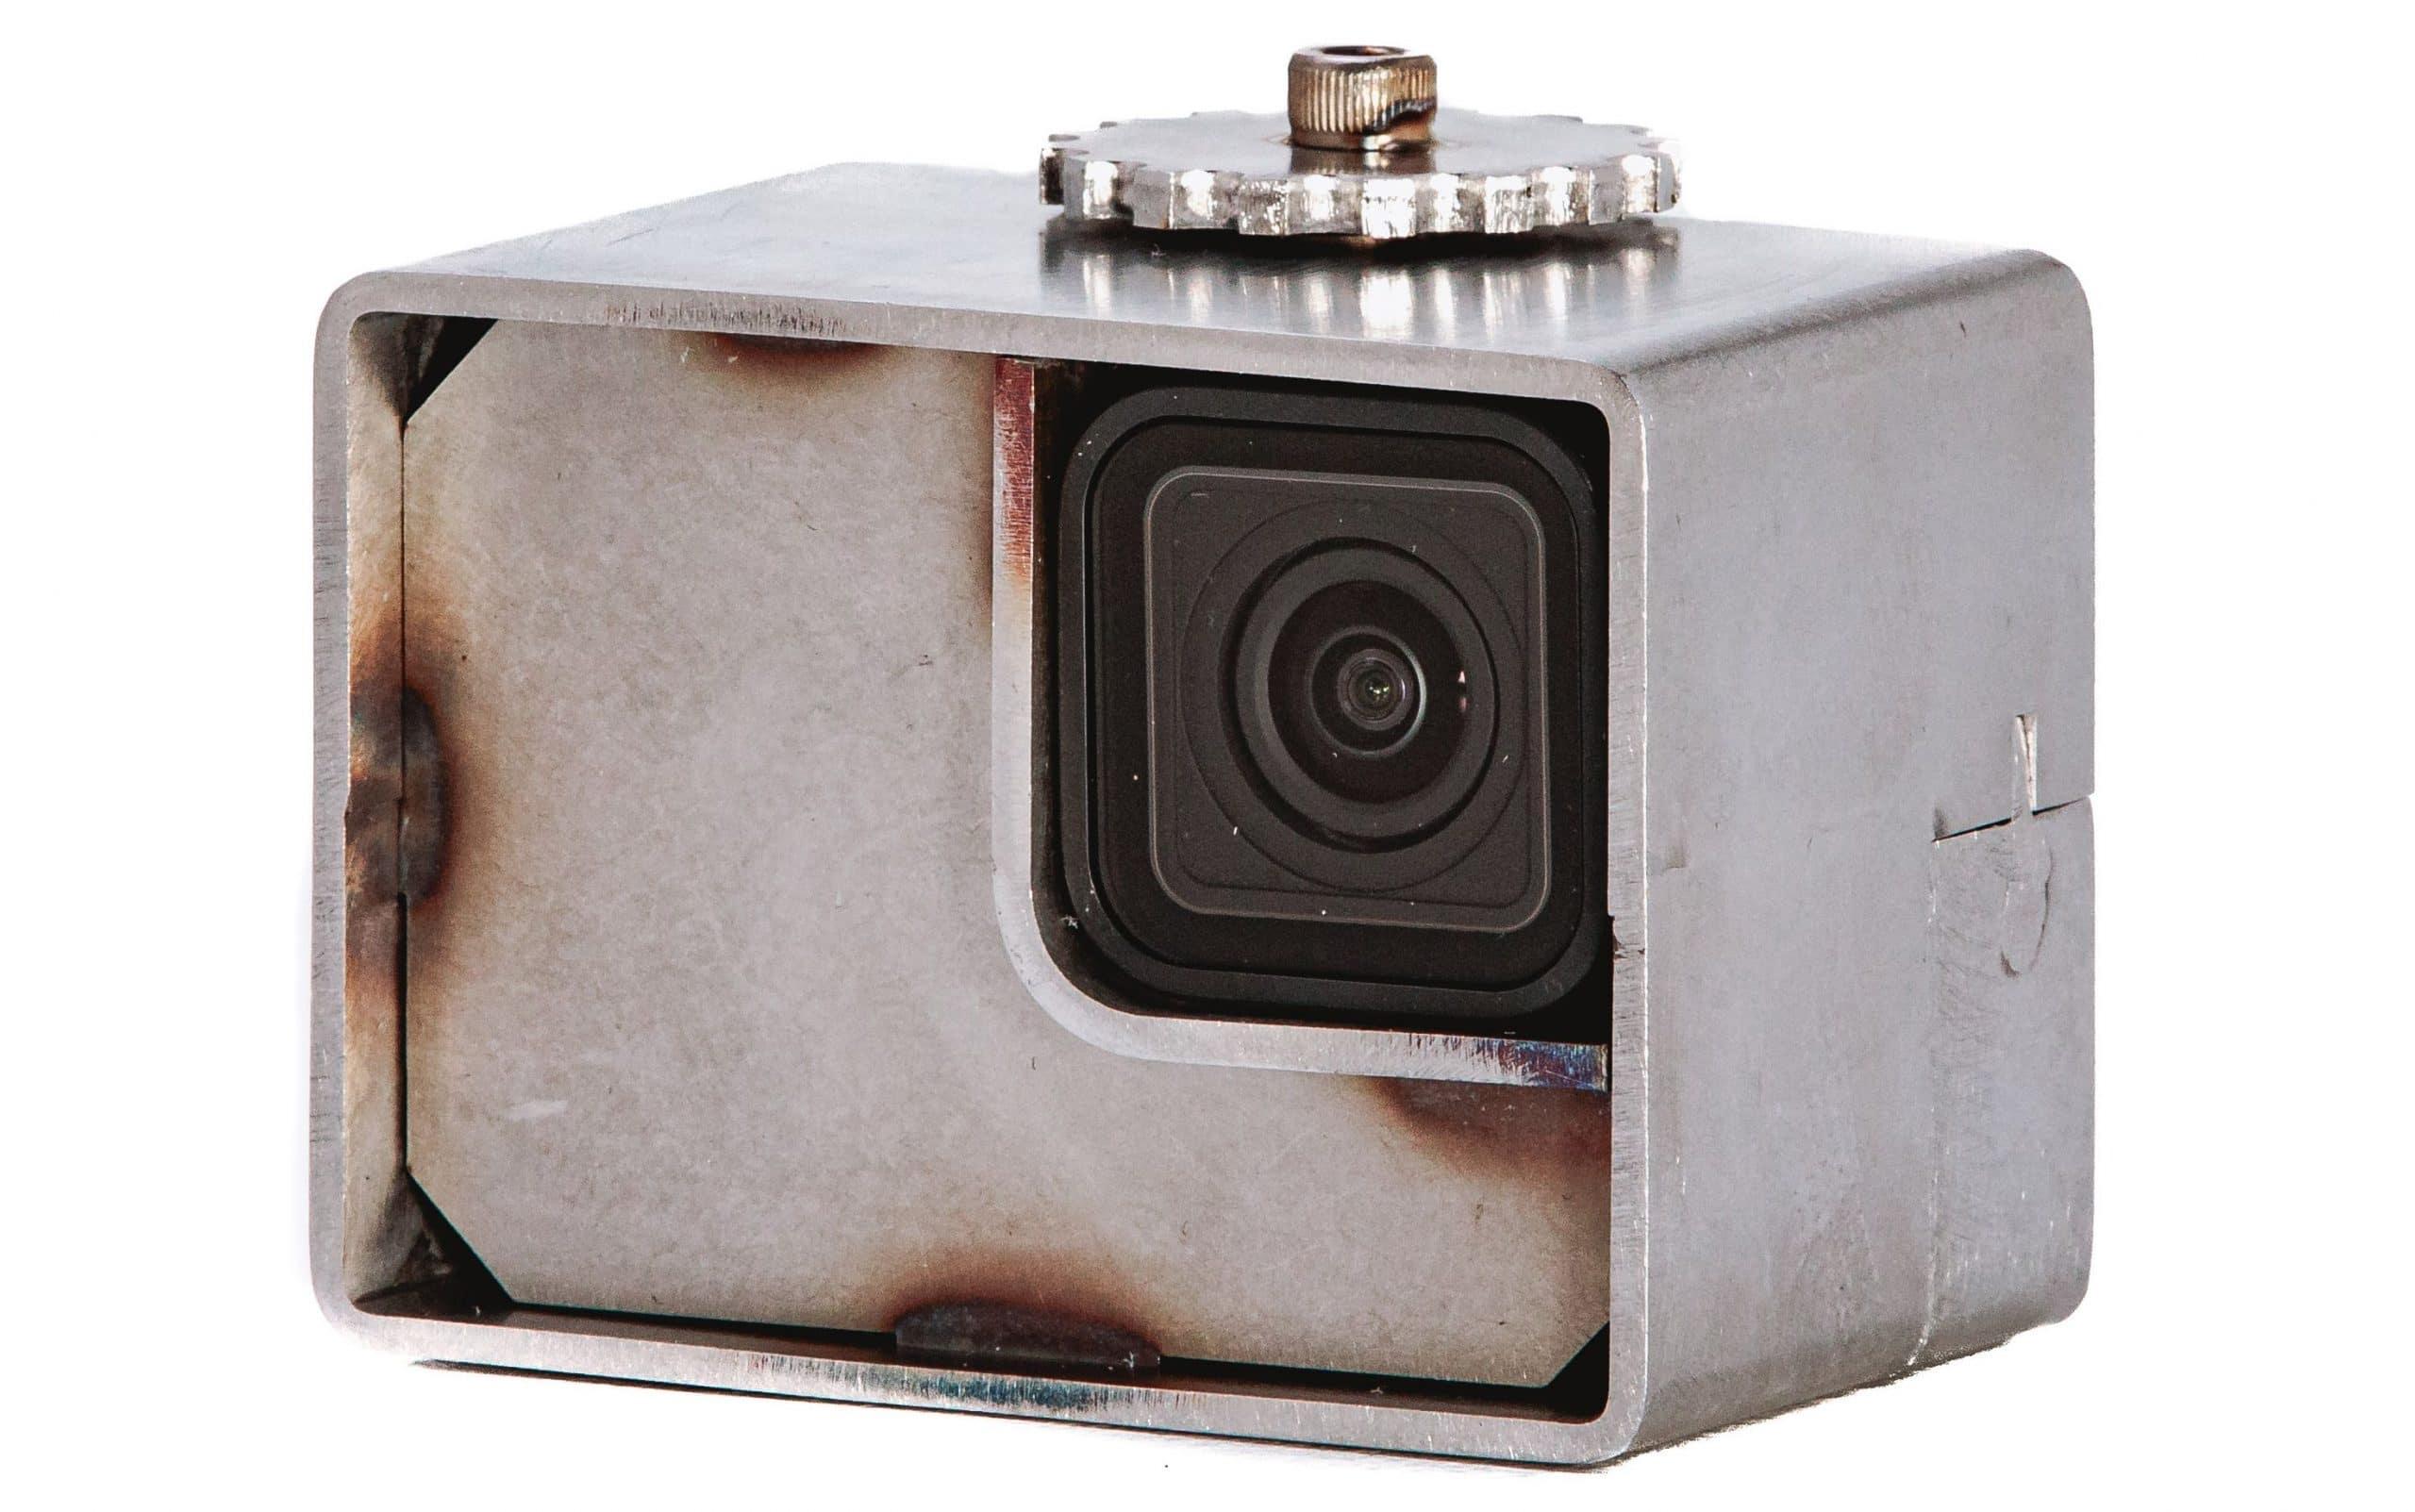 GP Sewer Camera Go Pro